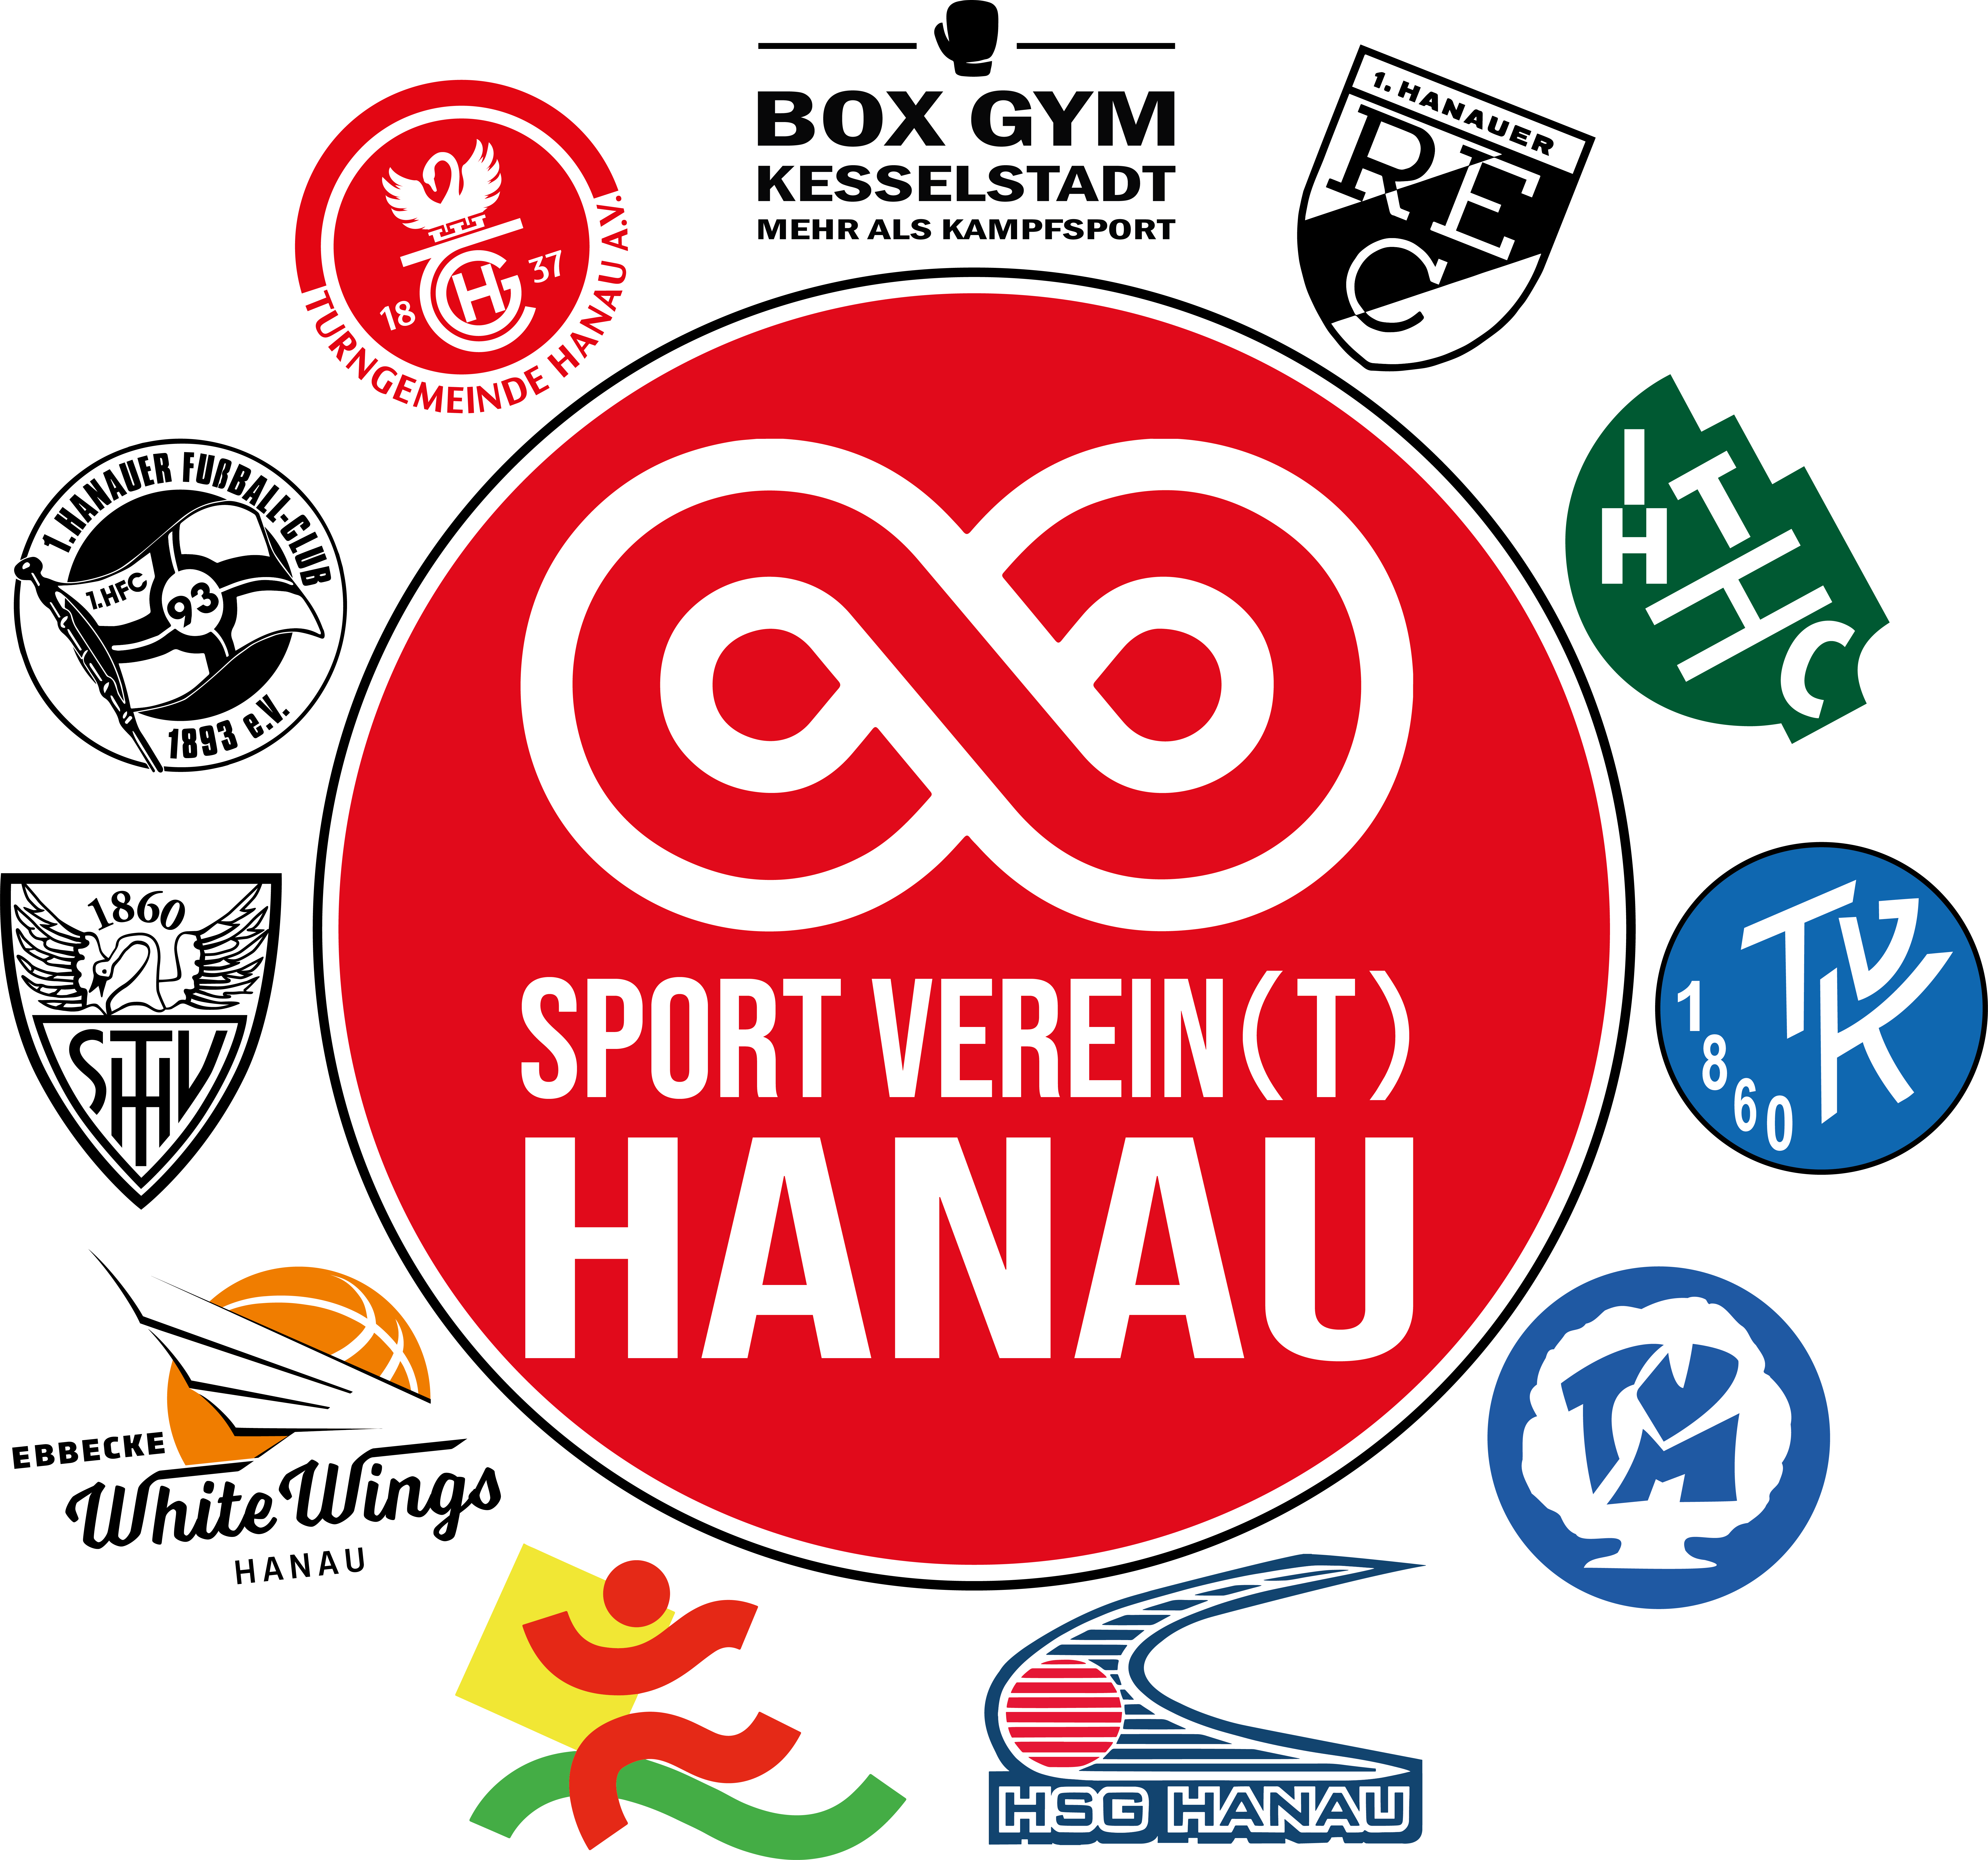 SPORT VEREIN(T) Hanau